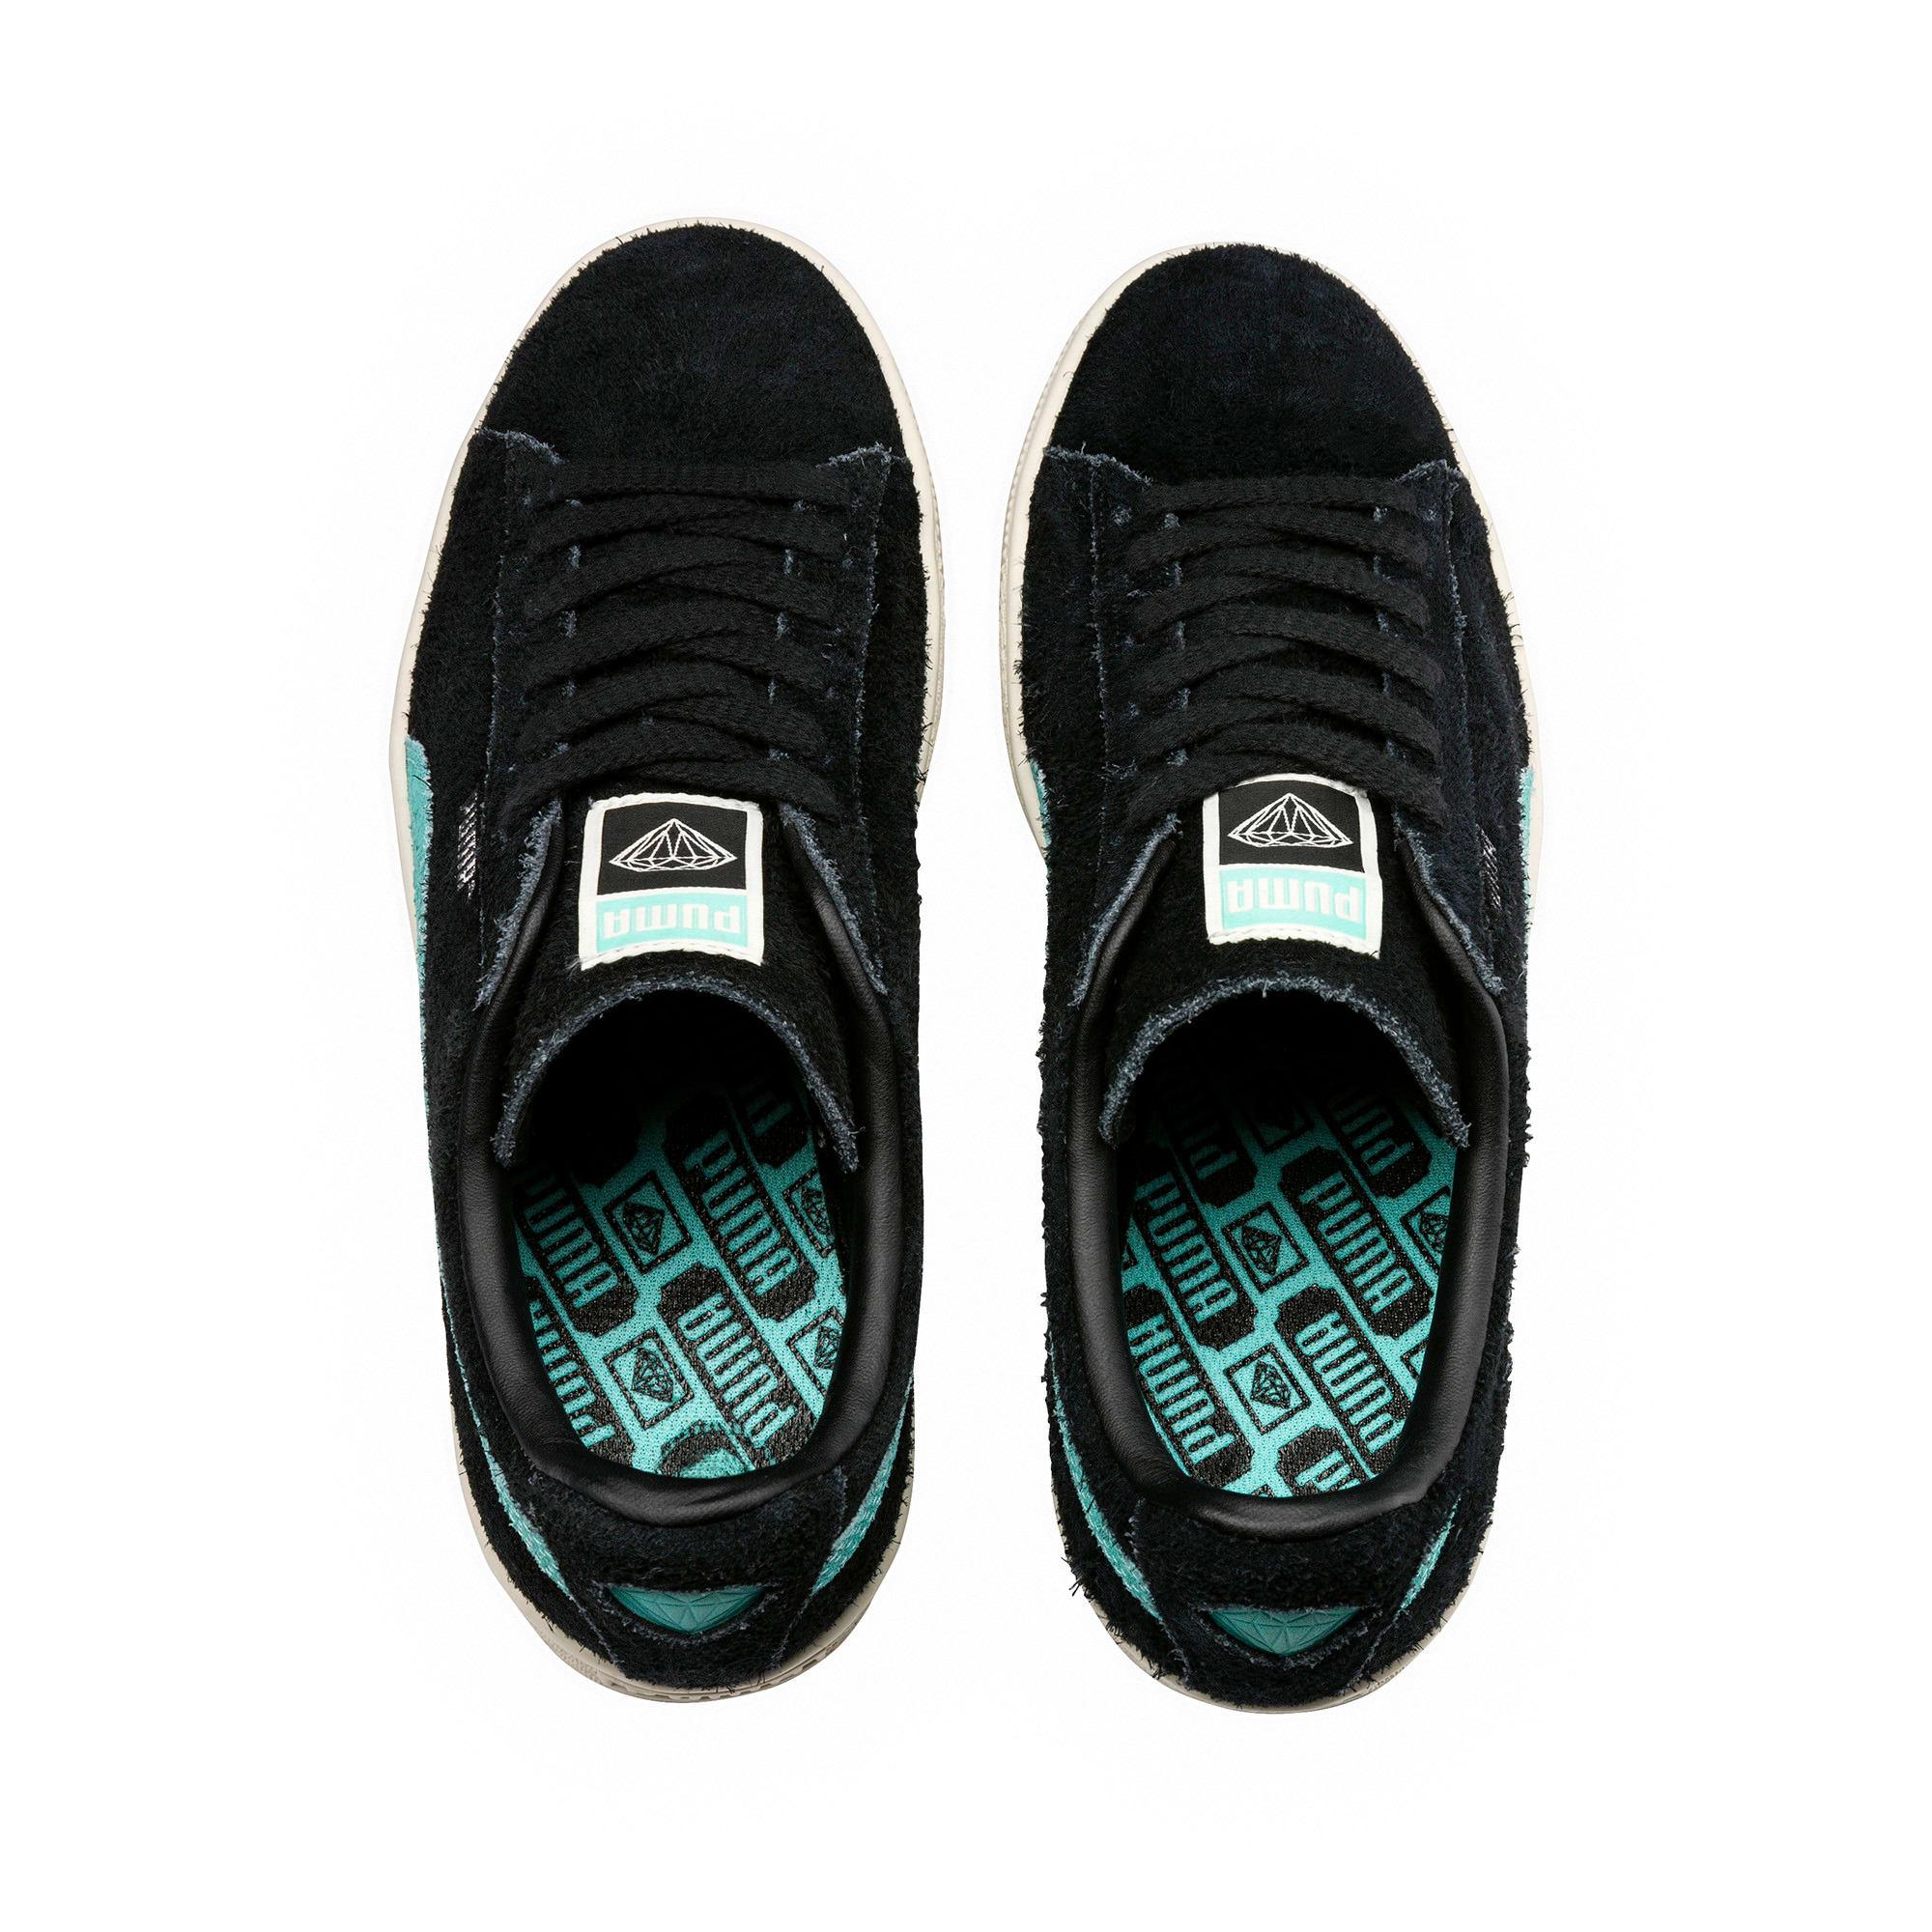 Thumbnail 5 of PUMA x DIAMOND Suede Sneakers, Puma Black-Diamond Blue, medium